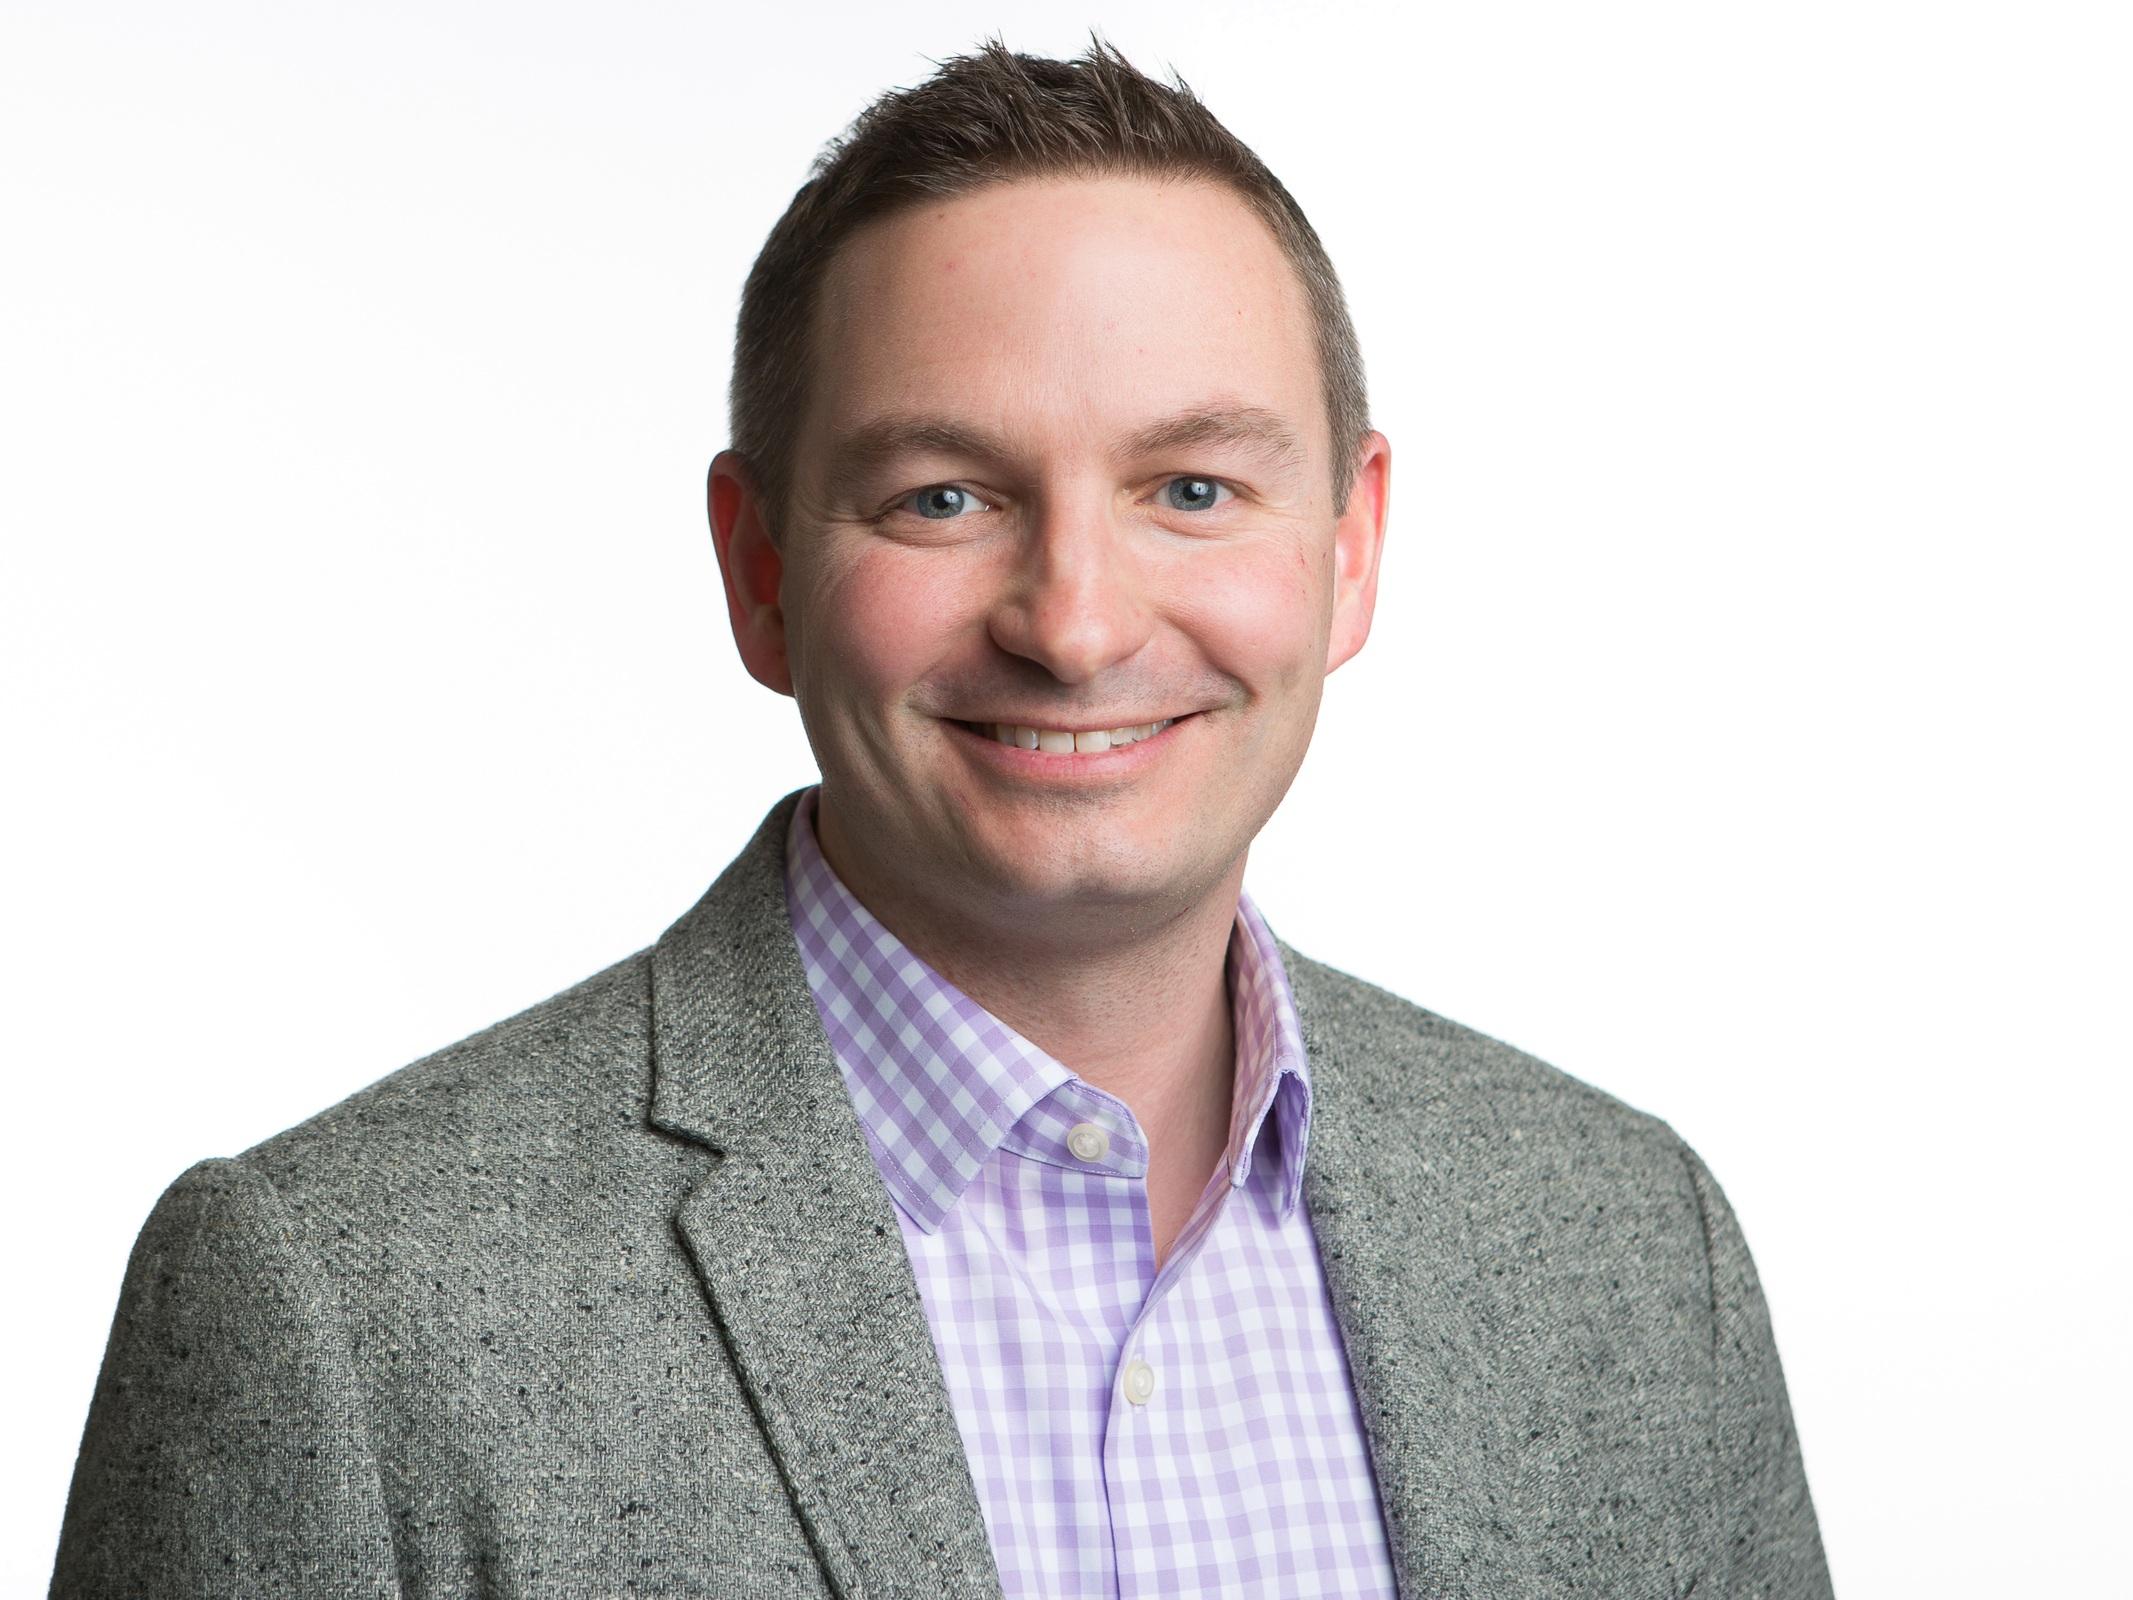 Mike Sielski - SPORTS COLUMNIST | THE PHILADELPHIA INQUIRER, THE PHILADELPHIA DAILY NEWS, PHILLY.COM